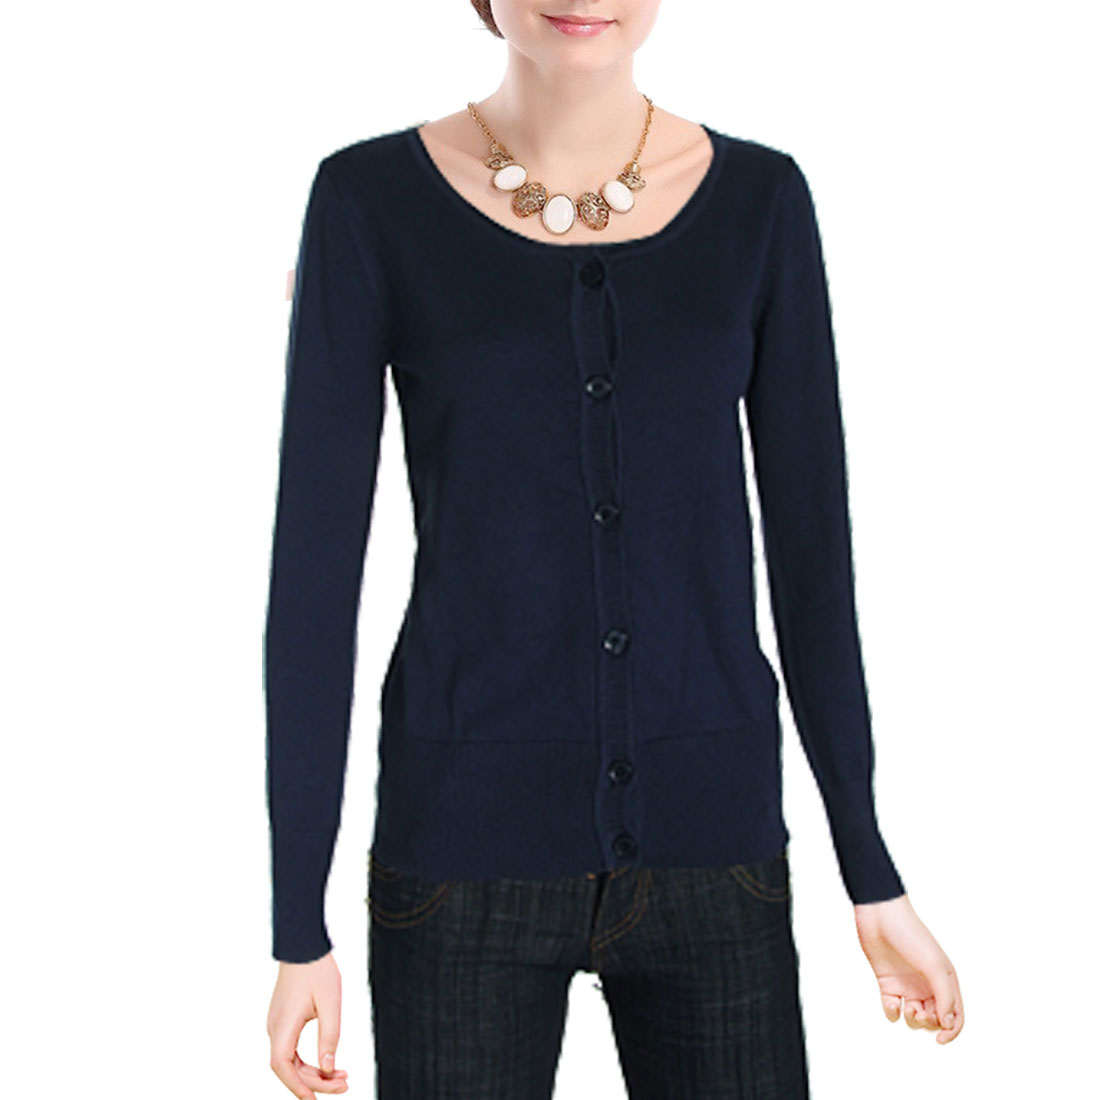 Dark Blue Long Sleeves Ladies Scoop Neckline Size S Knitted Sweater